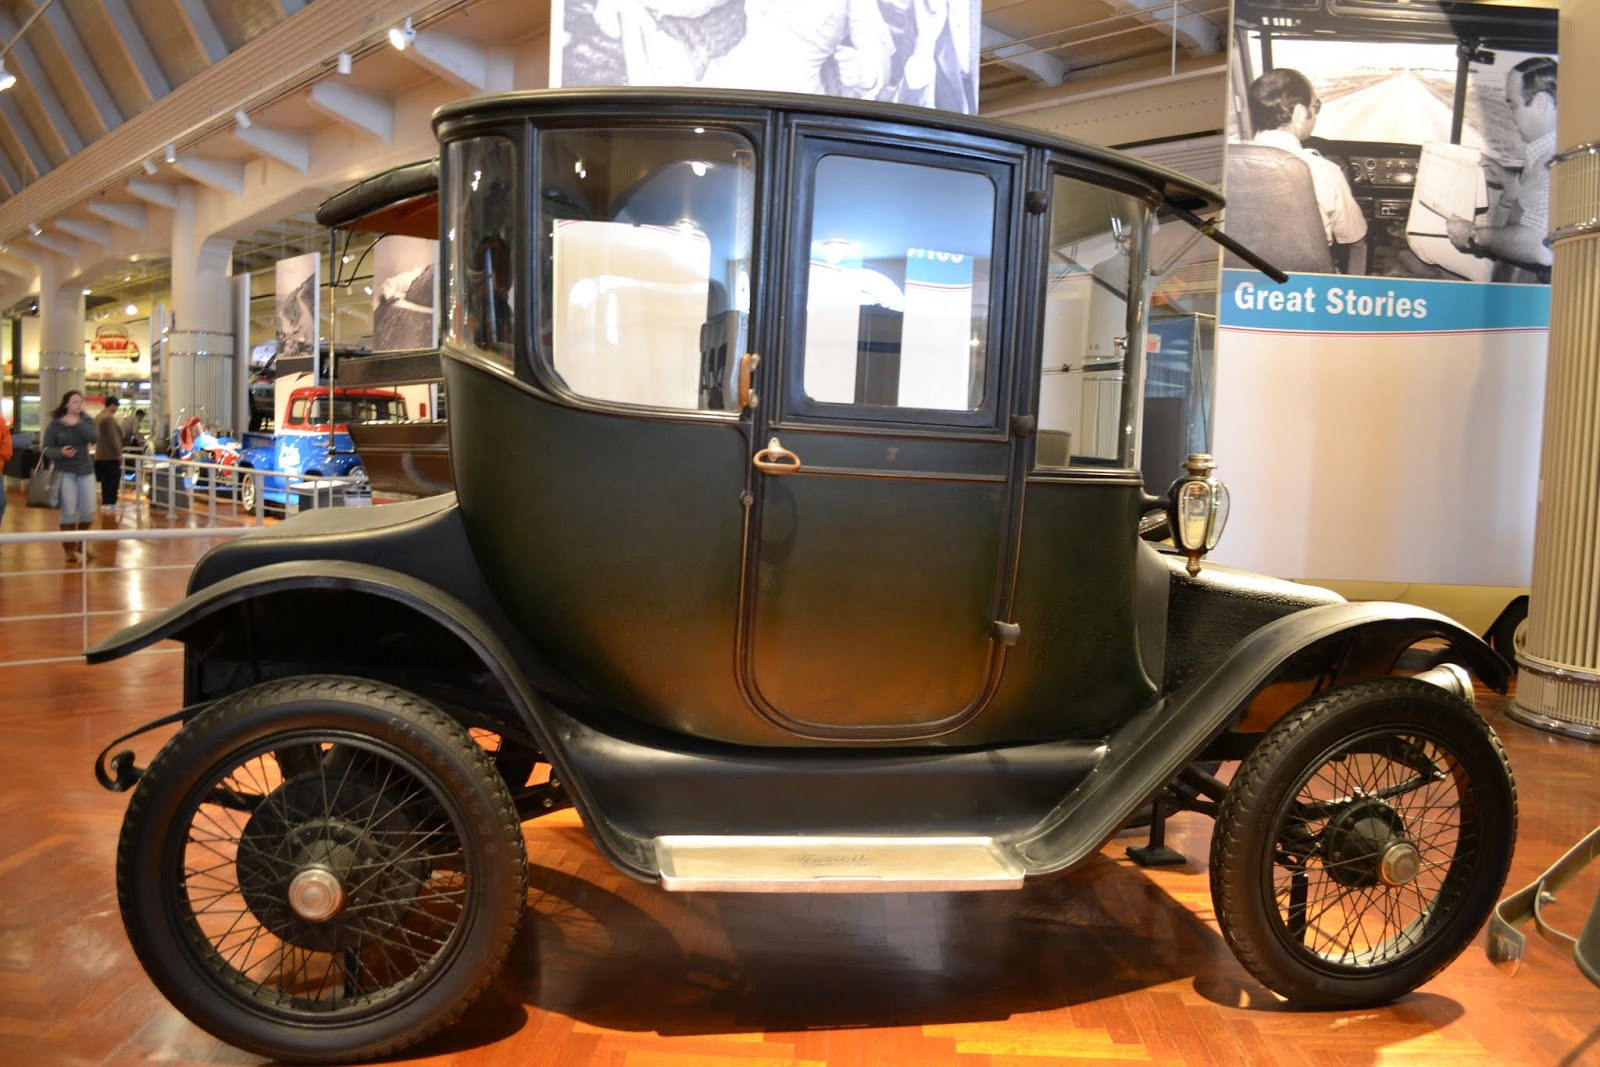 1914 Detroit Electric Model 47- автомобиль Клары Форд. Музей Генри Форда. Дирборн, Мичиган (Henry Ford Museum, Dearborn, MI)